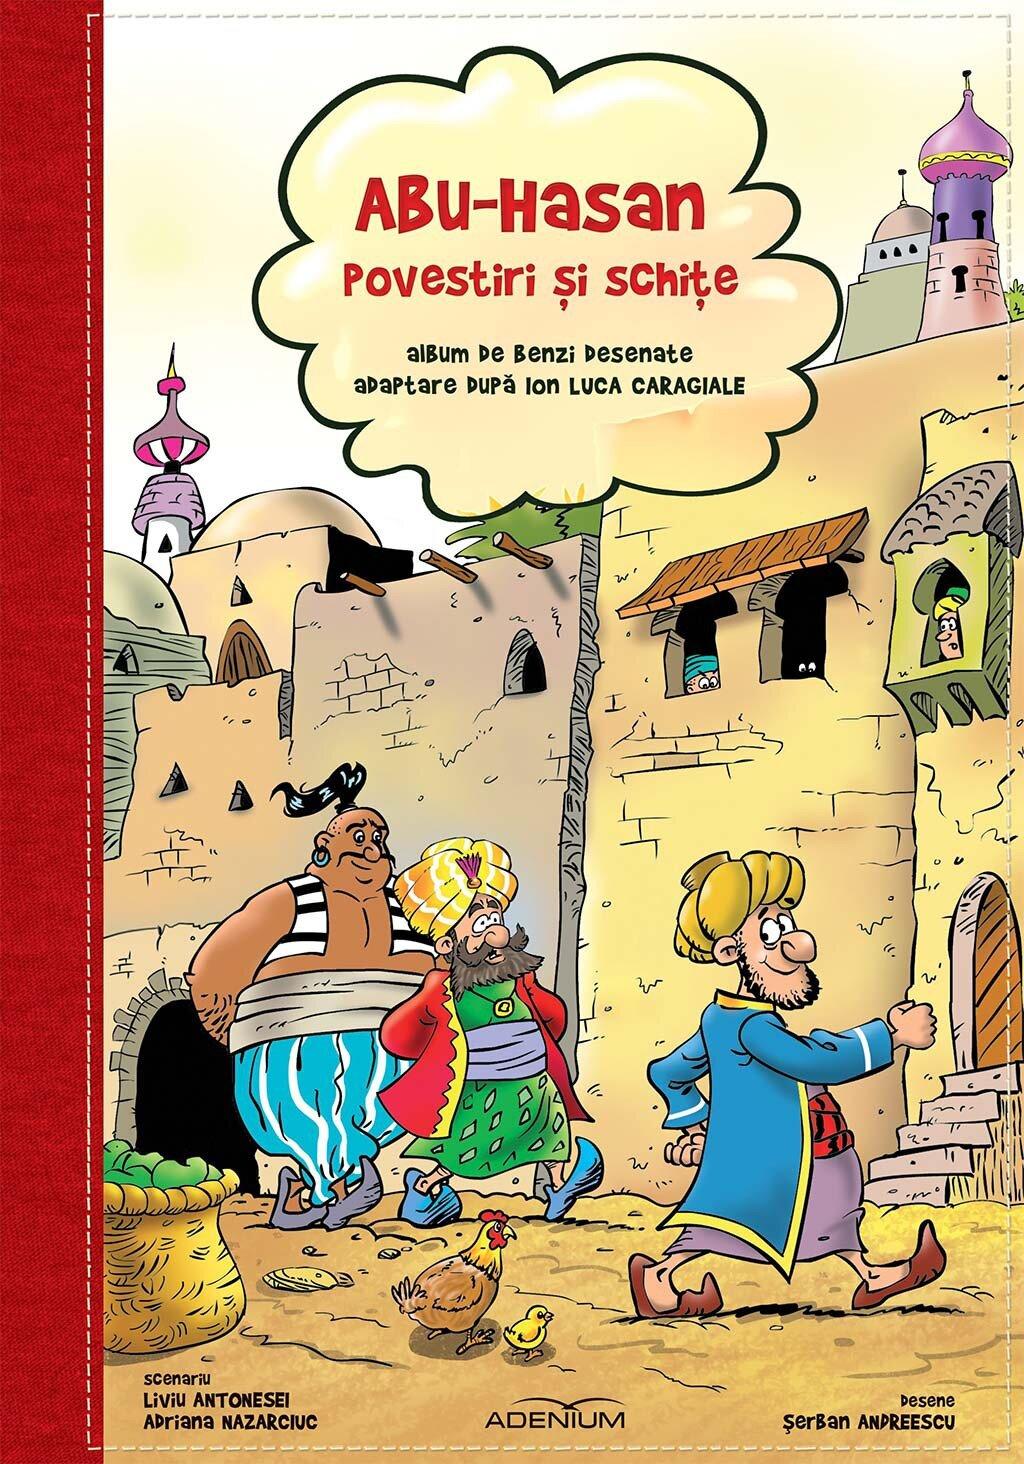 BD - Abu-Hasan. Povestiri si schite (eBook)